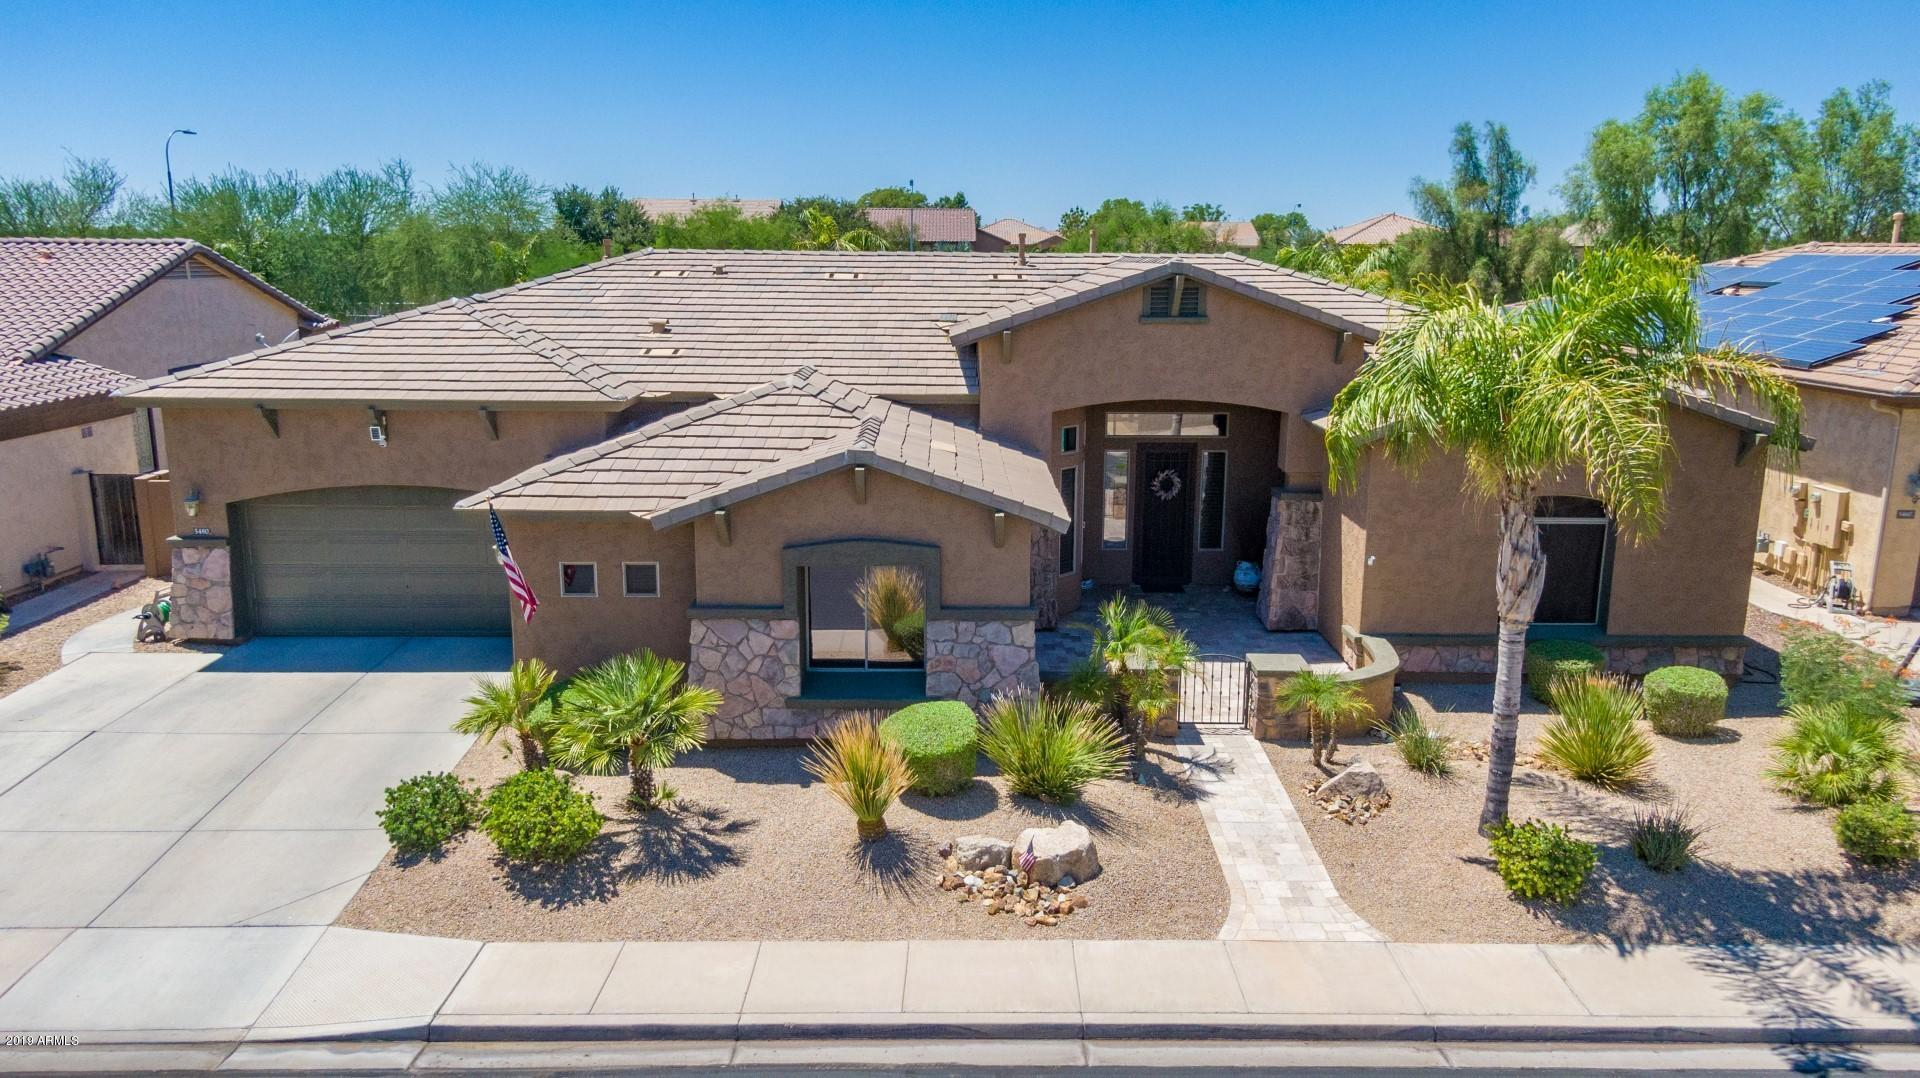 MLS 5967725 5480 S DRAGOON Drive, Chandler, AZ 85249 Chandler AZ Mesquite Grove Estates